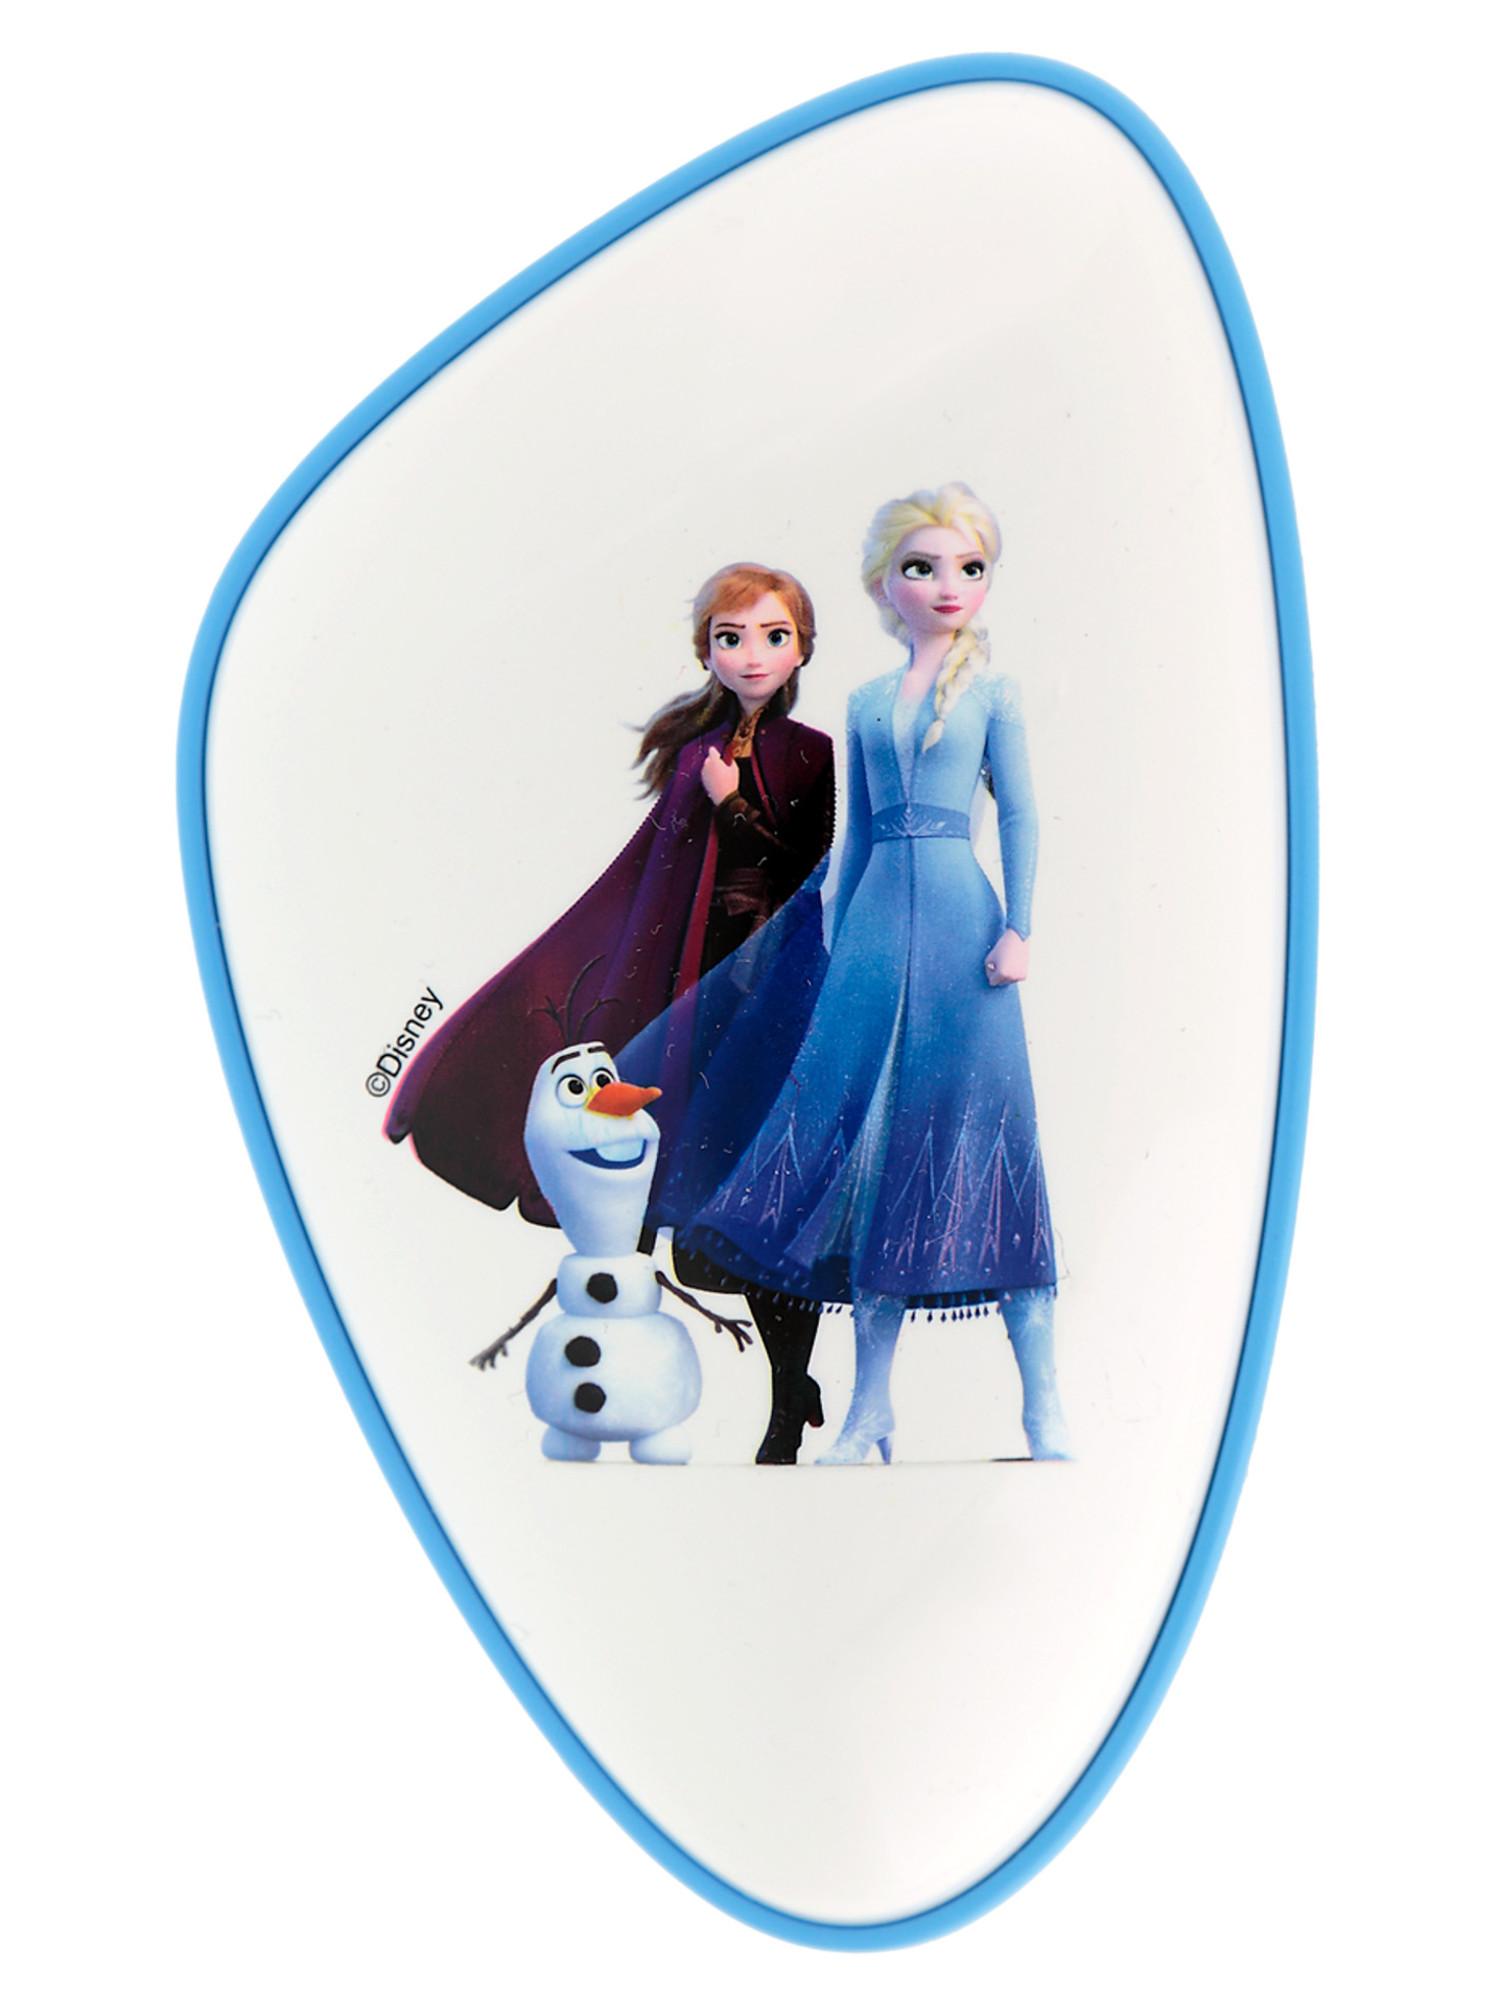 Rozčesávací kartáč na vlasy Dessata Disney Frozen II (31191) + DÁREK ZDARMA